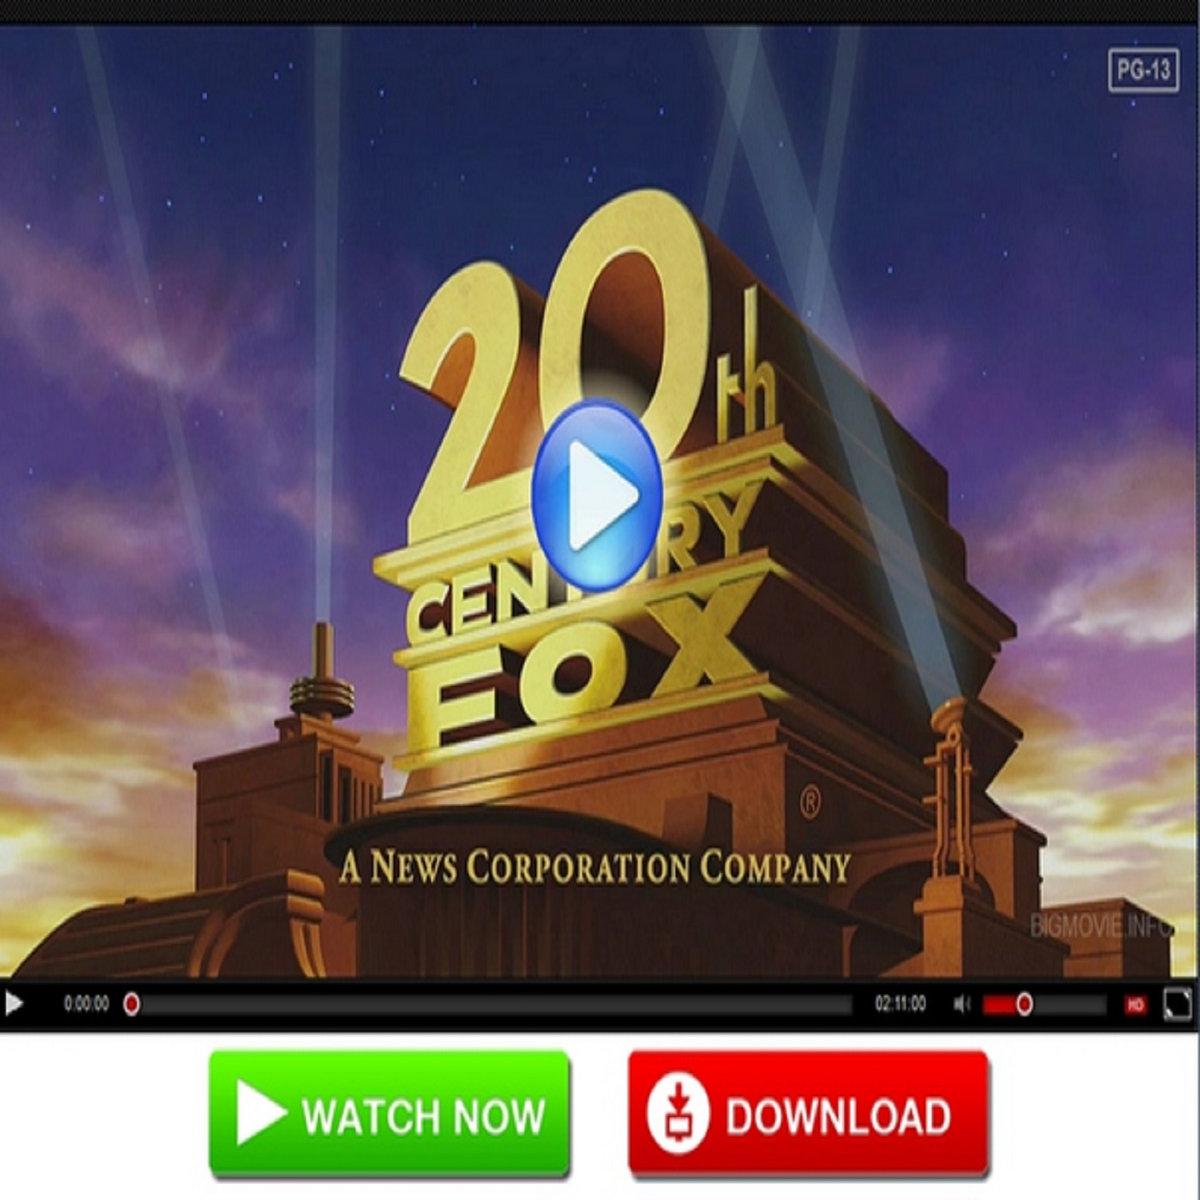 Full Watch John Wick Chapter 3 Parabellum 2019 Online Full Movie Hd Free Watchmulanfullmovie